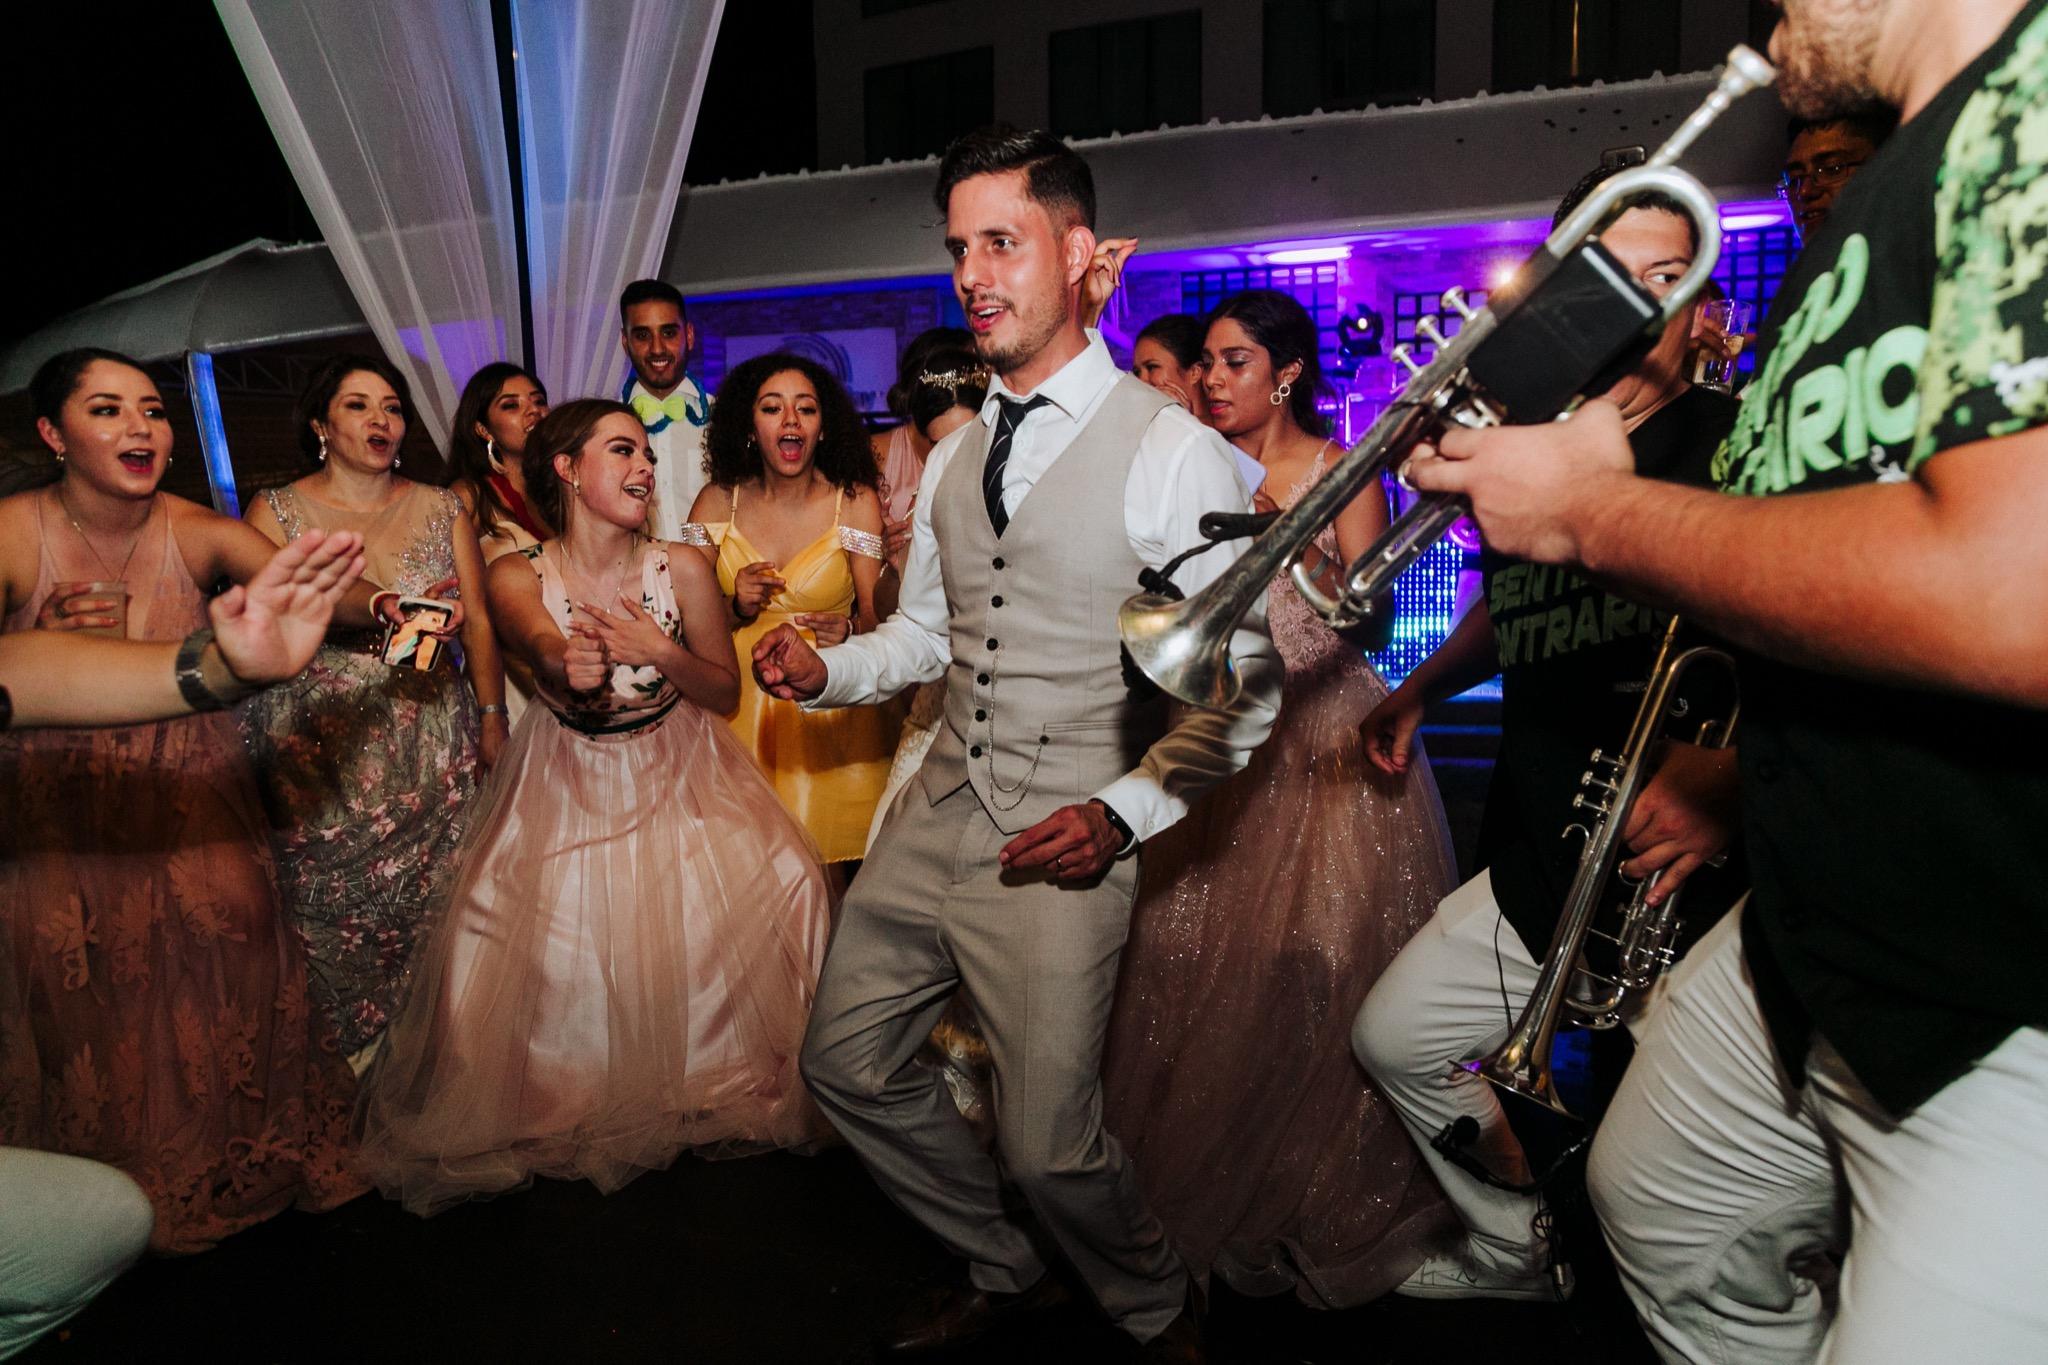 Javier_noriega_fotografo_bodas_profesional_zacatecas_mexico_mazatlan_sinaloa_photographer_weddings88